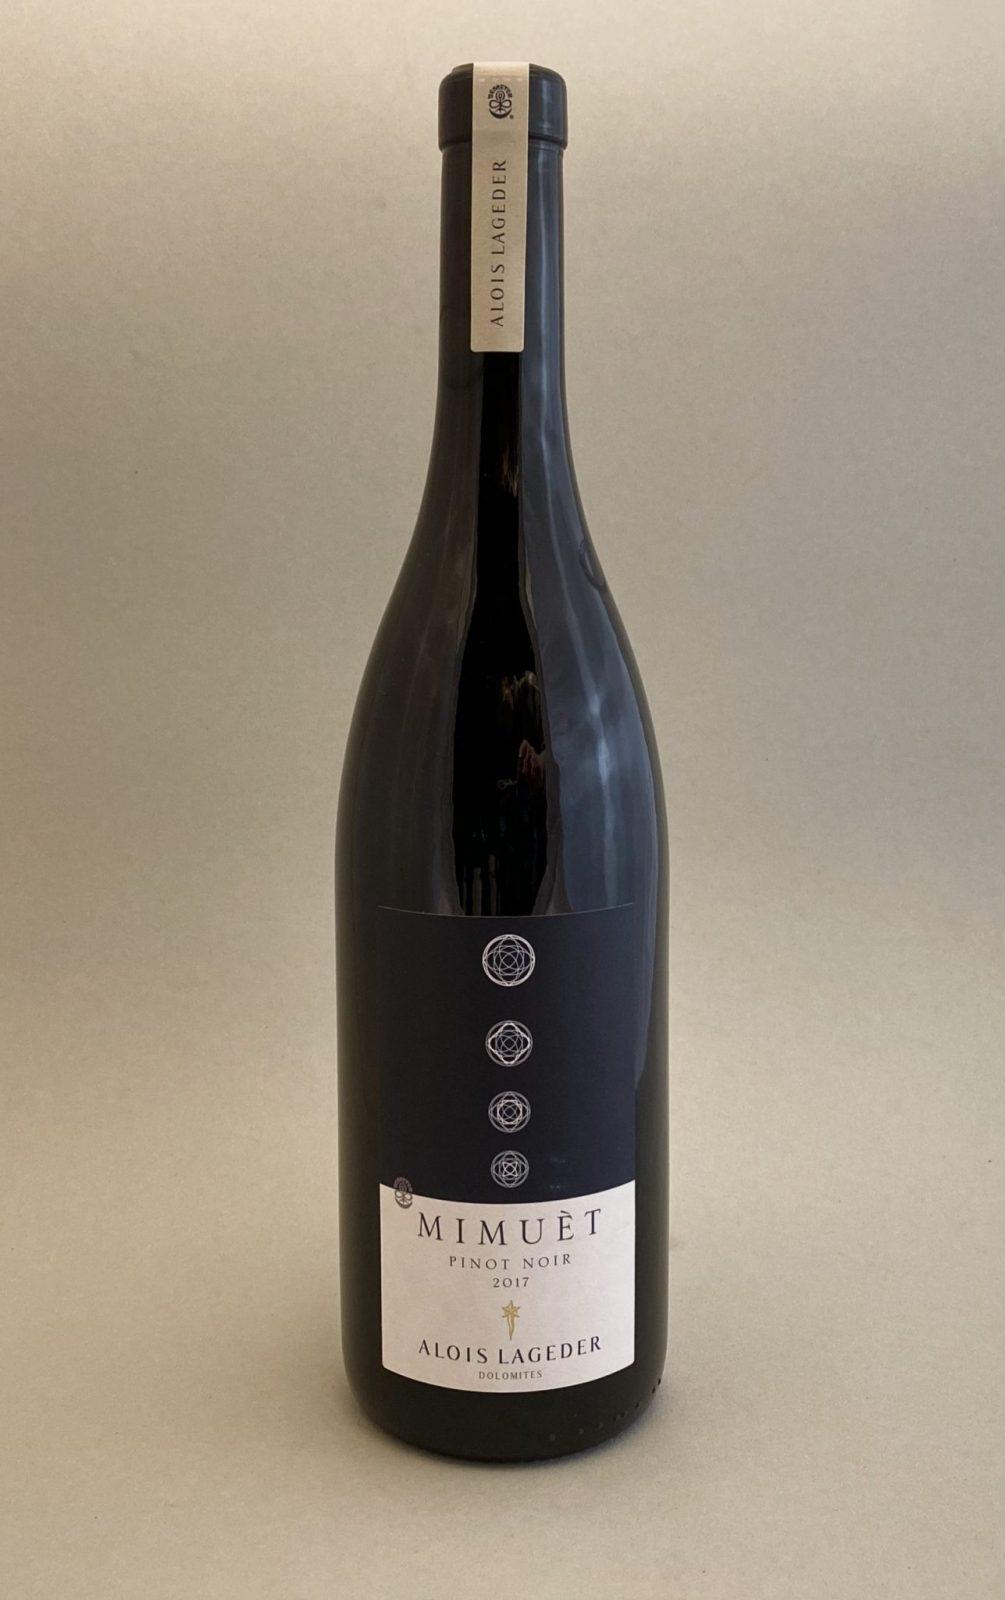 ALOIS LAGEDER Pinot Noir Mimuet Biodynamic 2017, vinoteka Bratislava Sunny wines slnecnice mesto, petrzalka, vino červené z Talianska, rozvoz vín, eshop